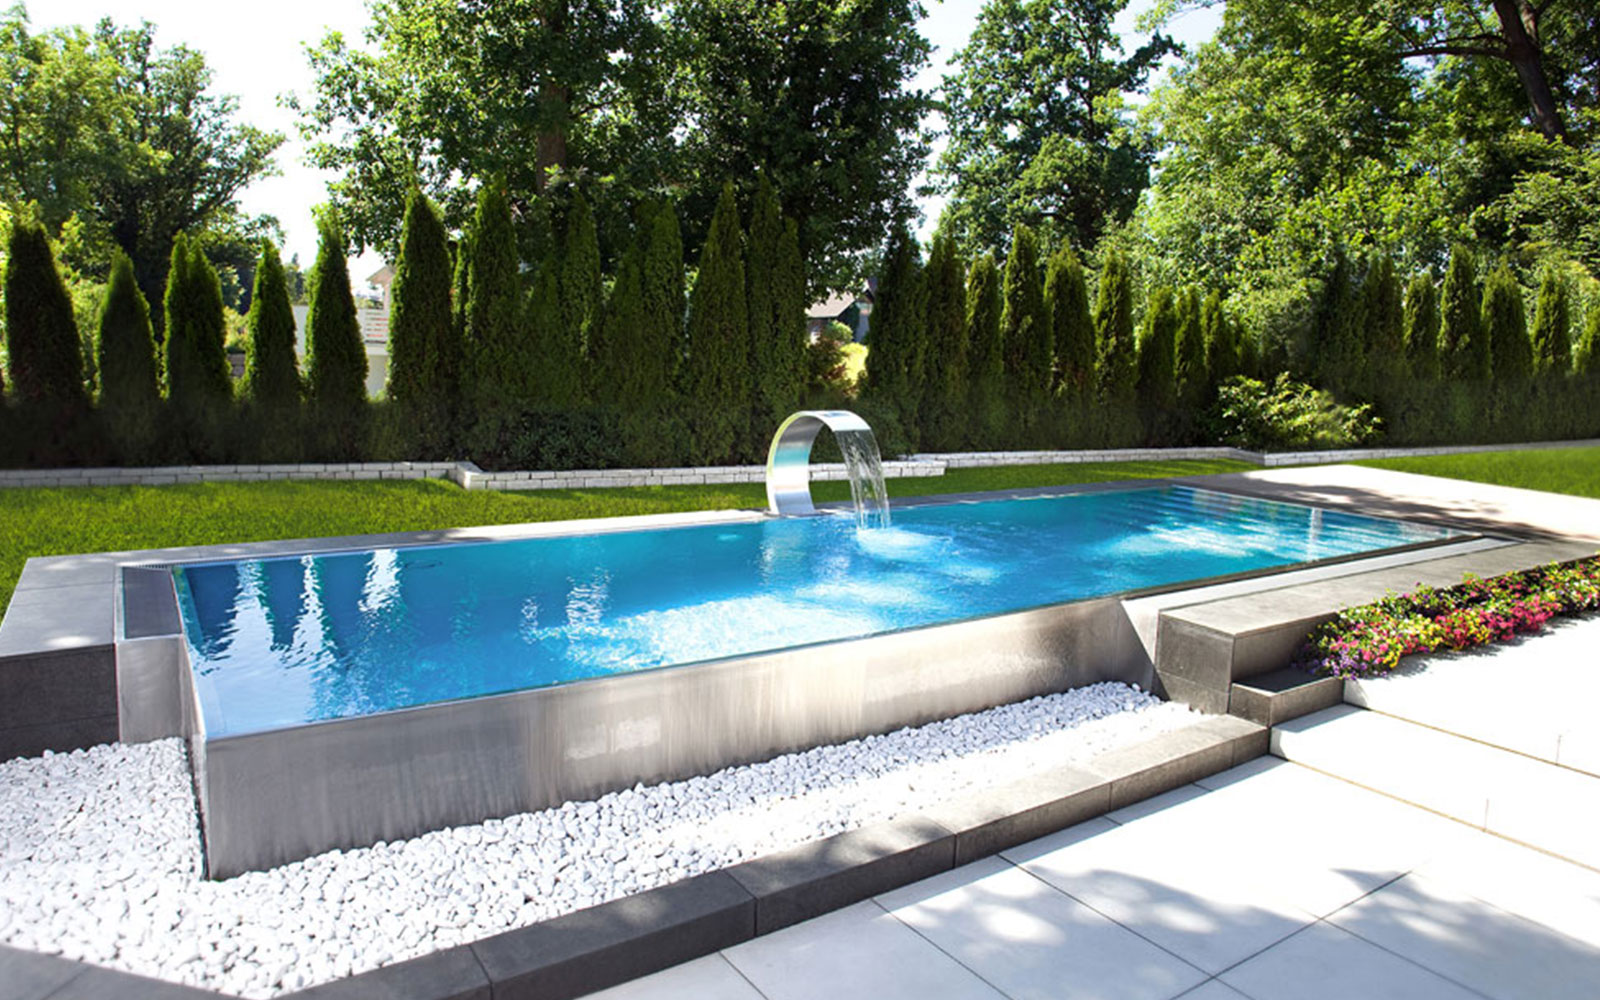 Neubau pools aus beton oder edelstahl schwimmbadservice for Pool aus stahl